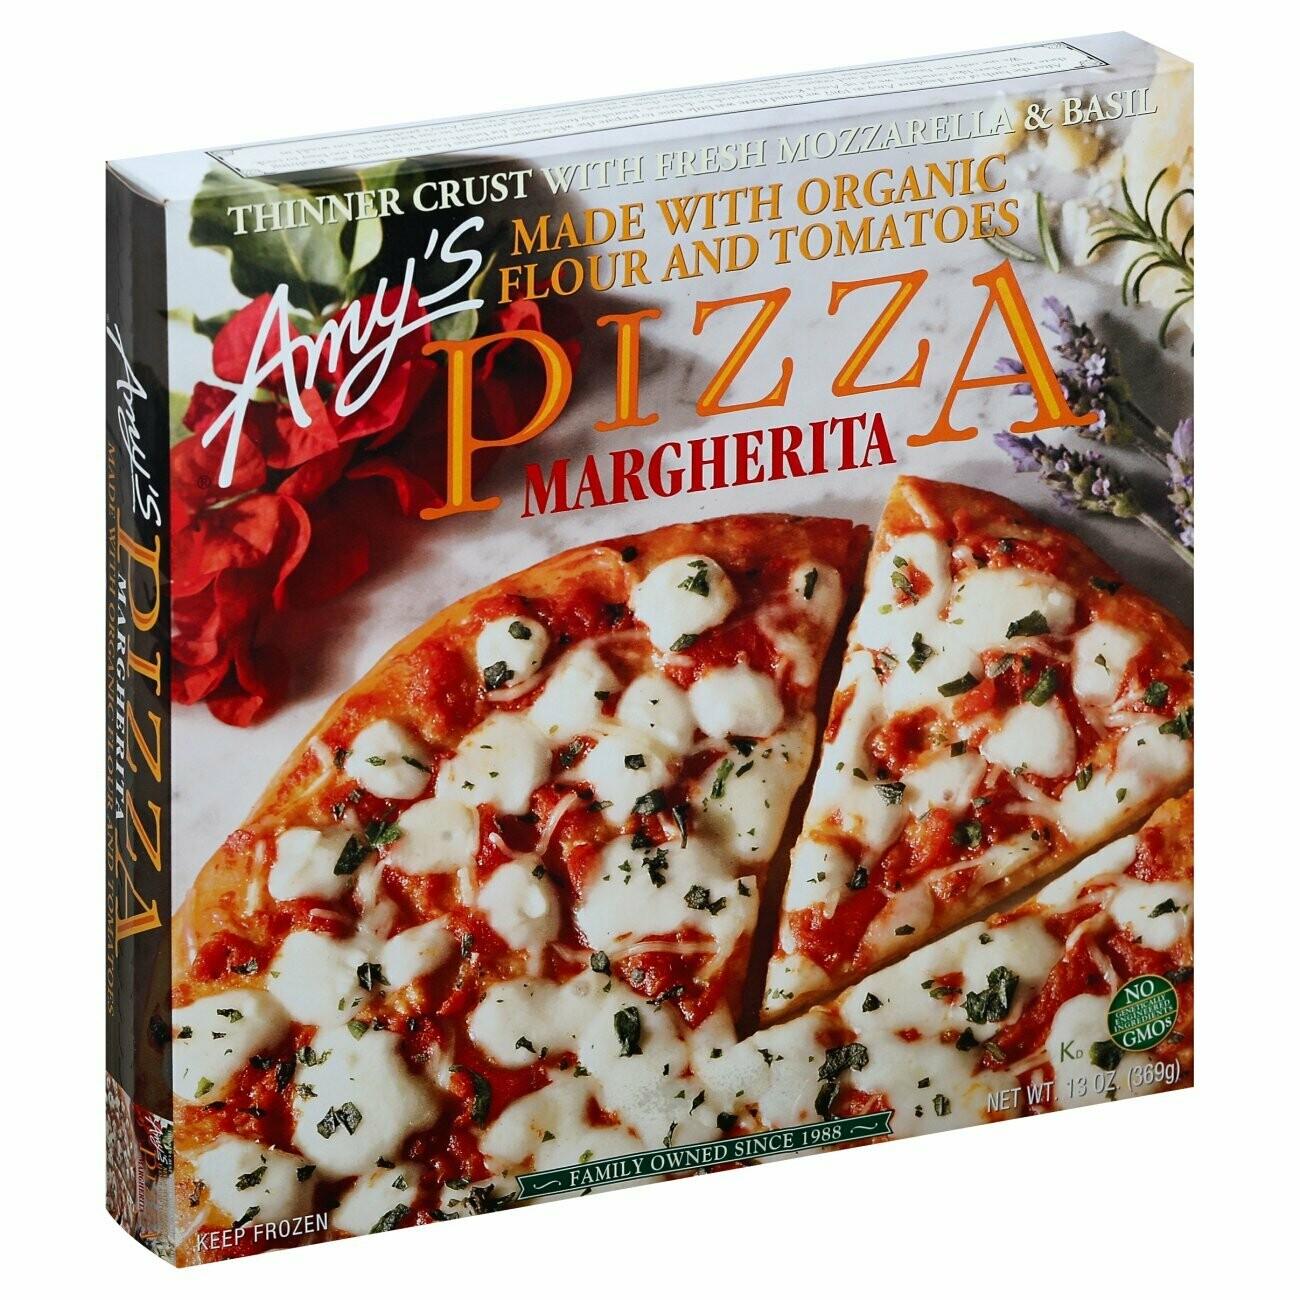 Amy's Pizza Margherita